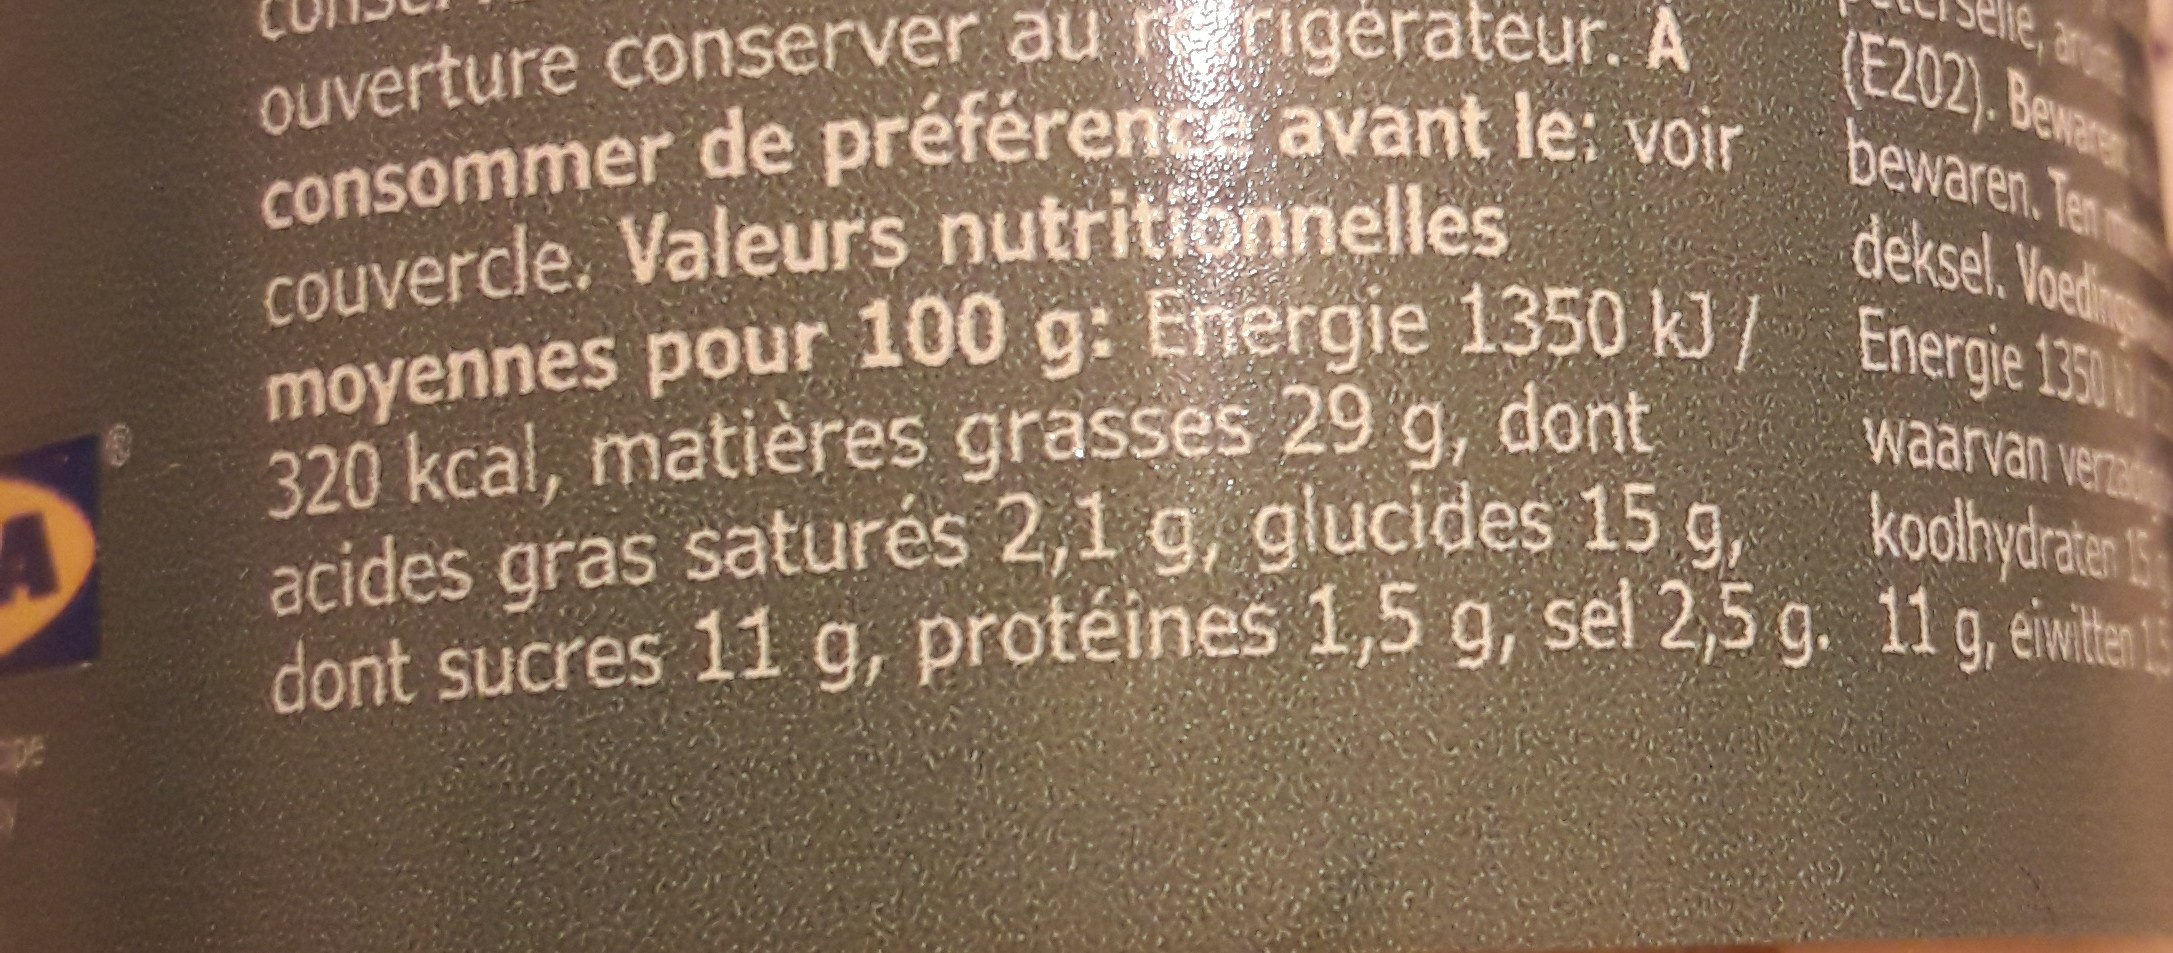 Sas Pepparrot (mierikswortelsaus) Pot - Informació nutricional - fr